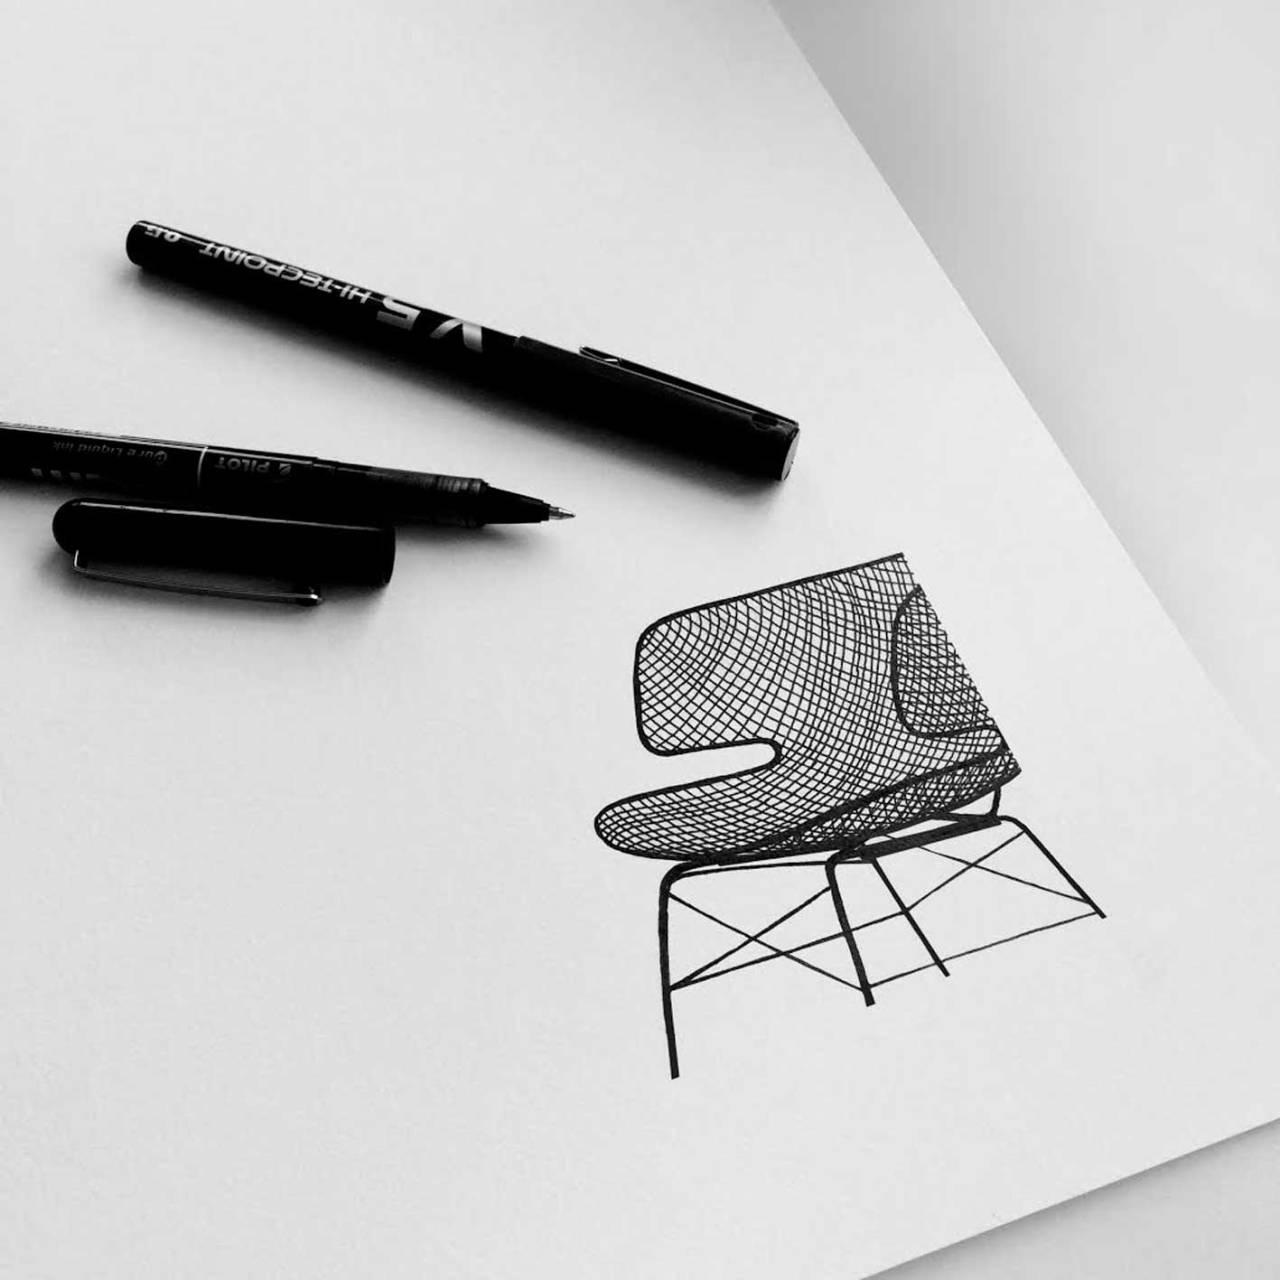 design_swennjed_rotring_03